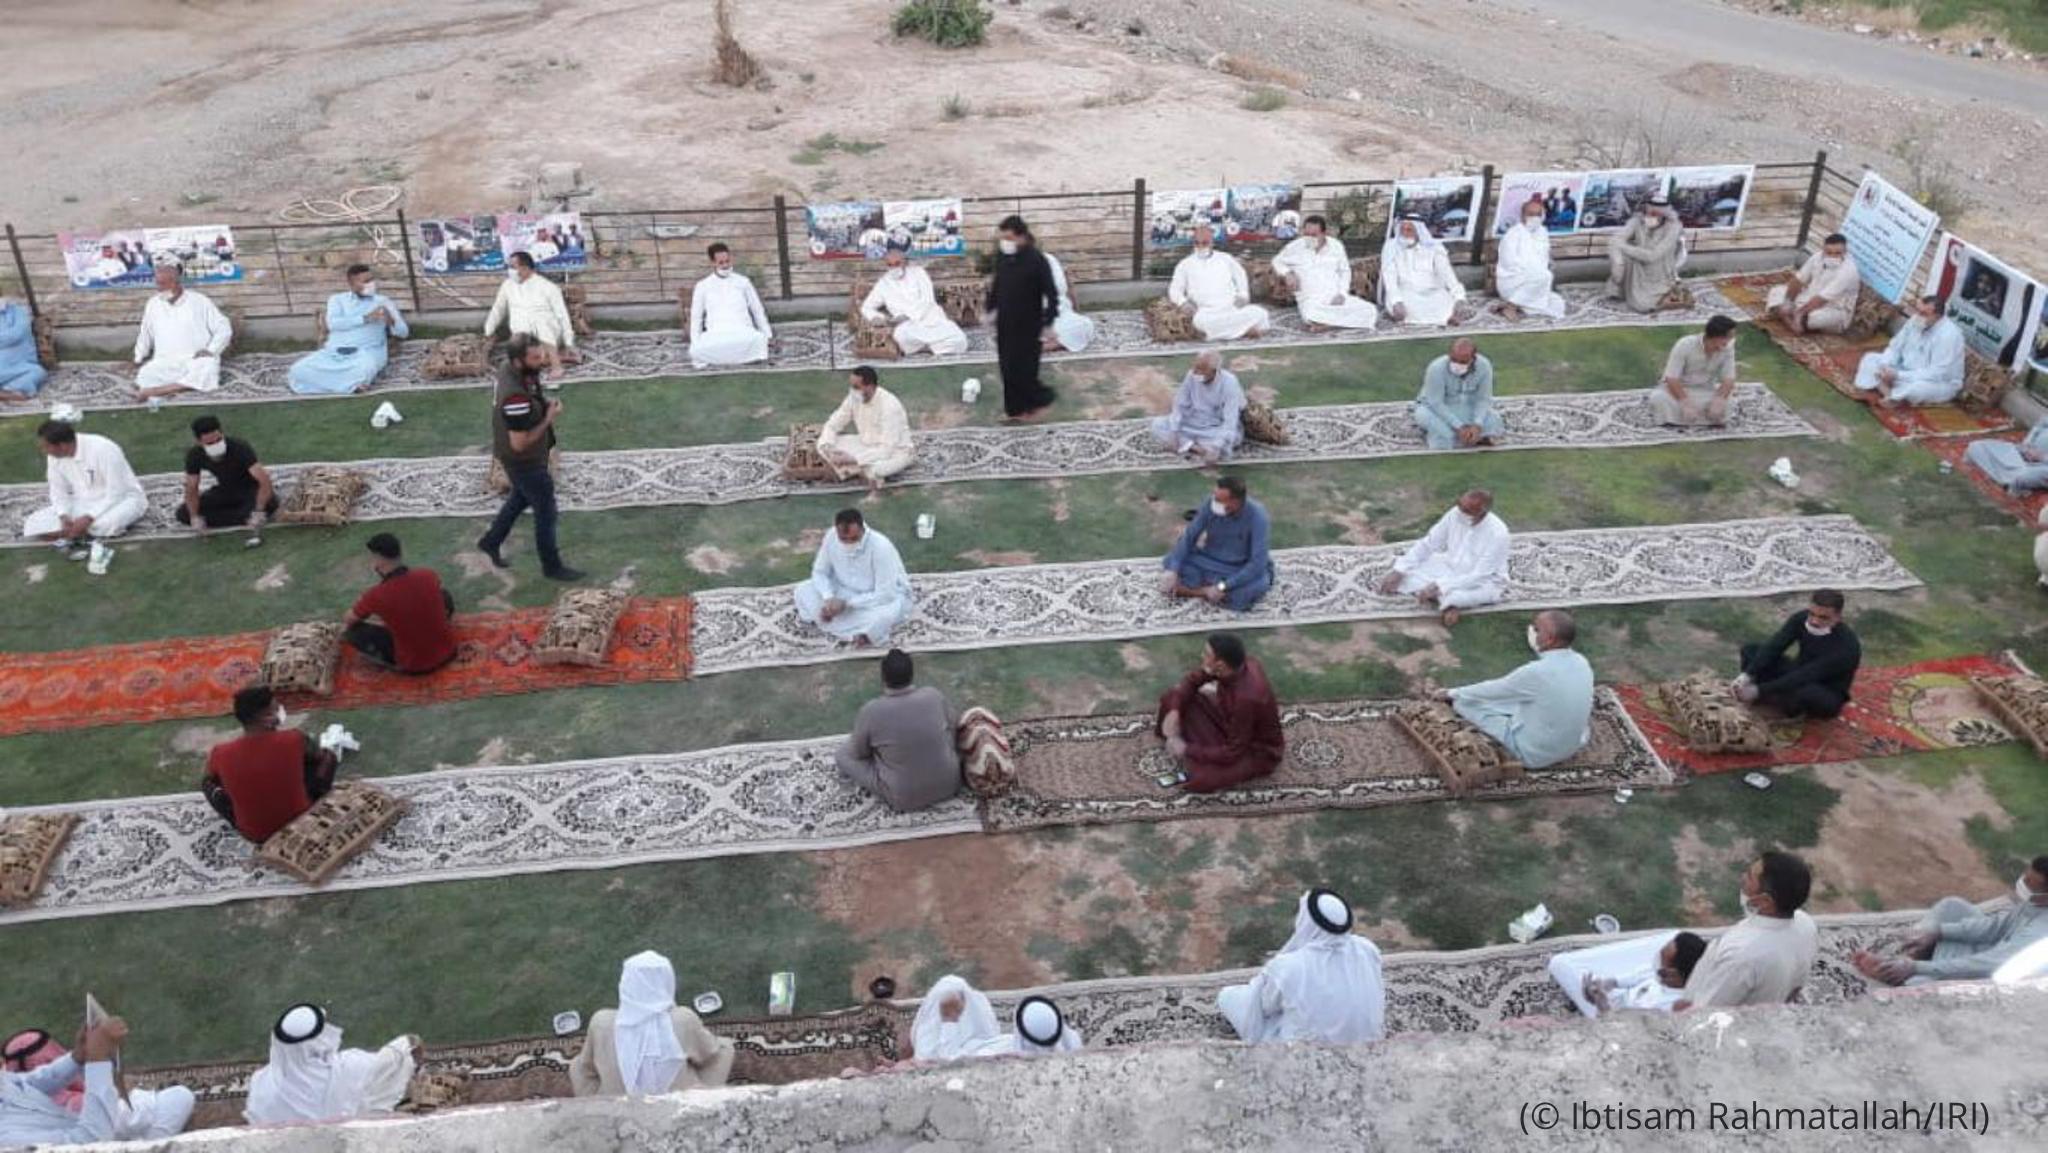 Hombre sentado ante una hilera de alfombras (© Ibtisam Rahmatallah/IRI)